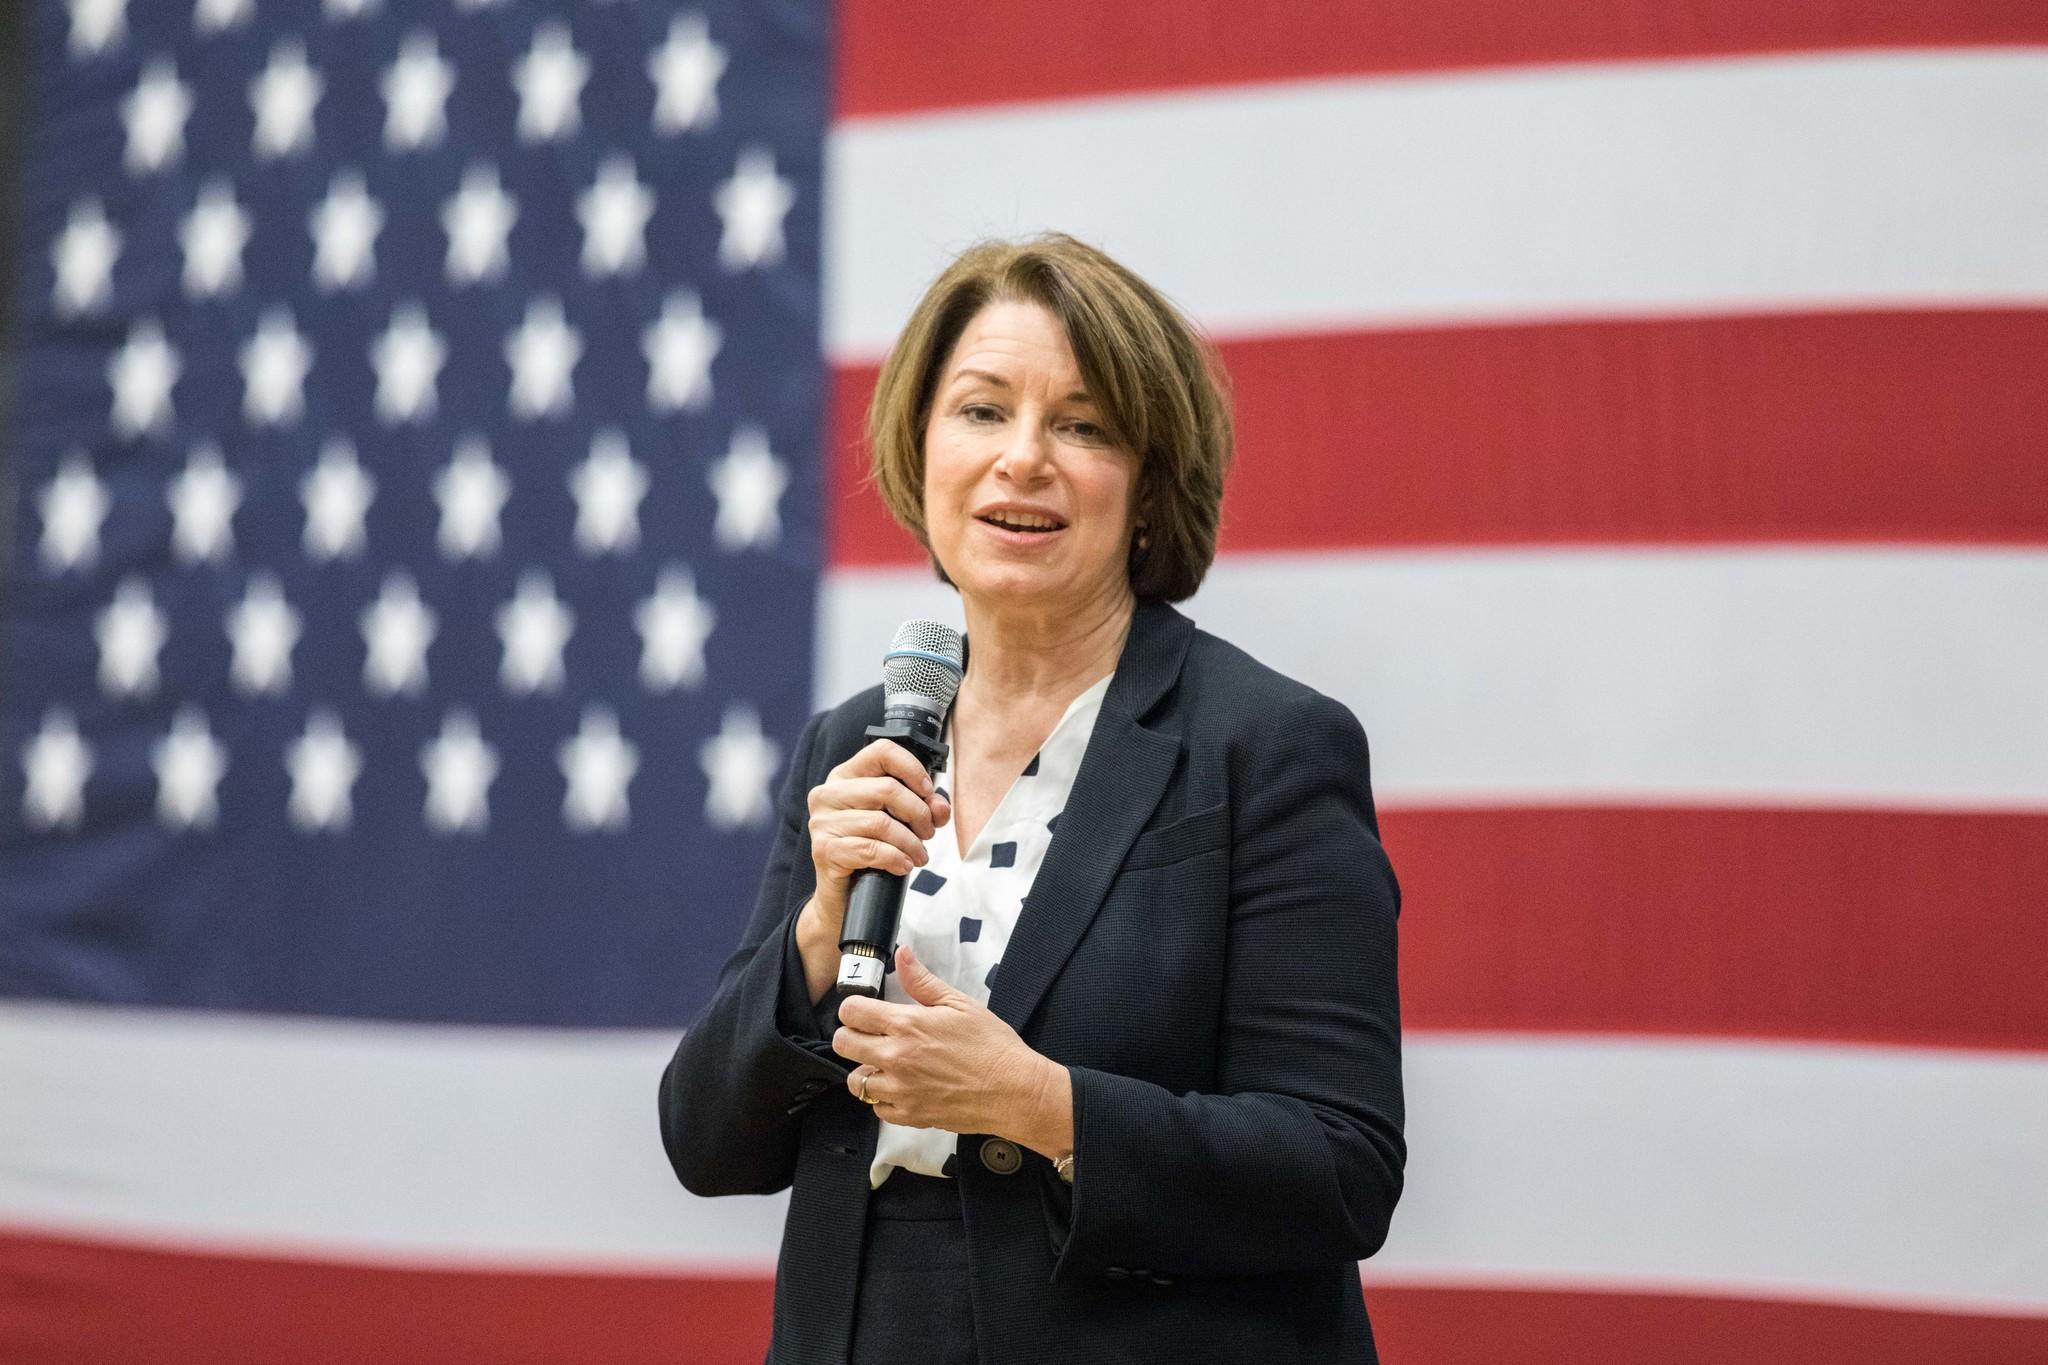 Sen. Amy Klobuchar slams Trump's Ukraine efforts as 'global Watergate'